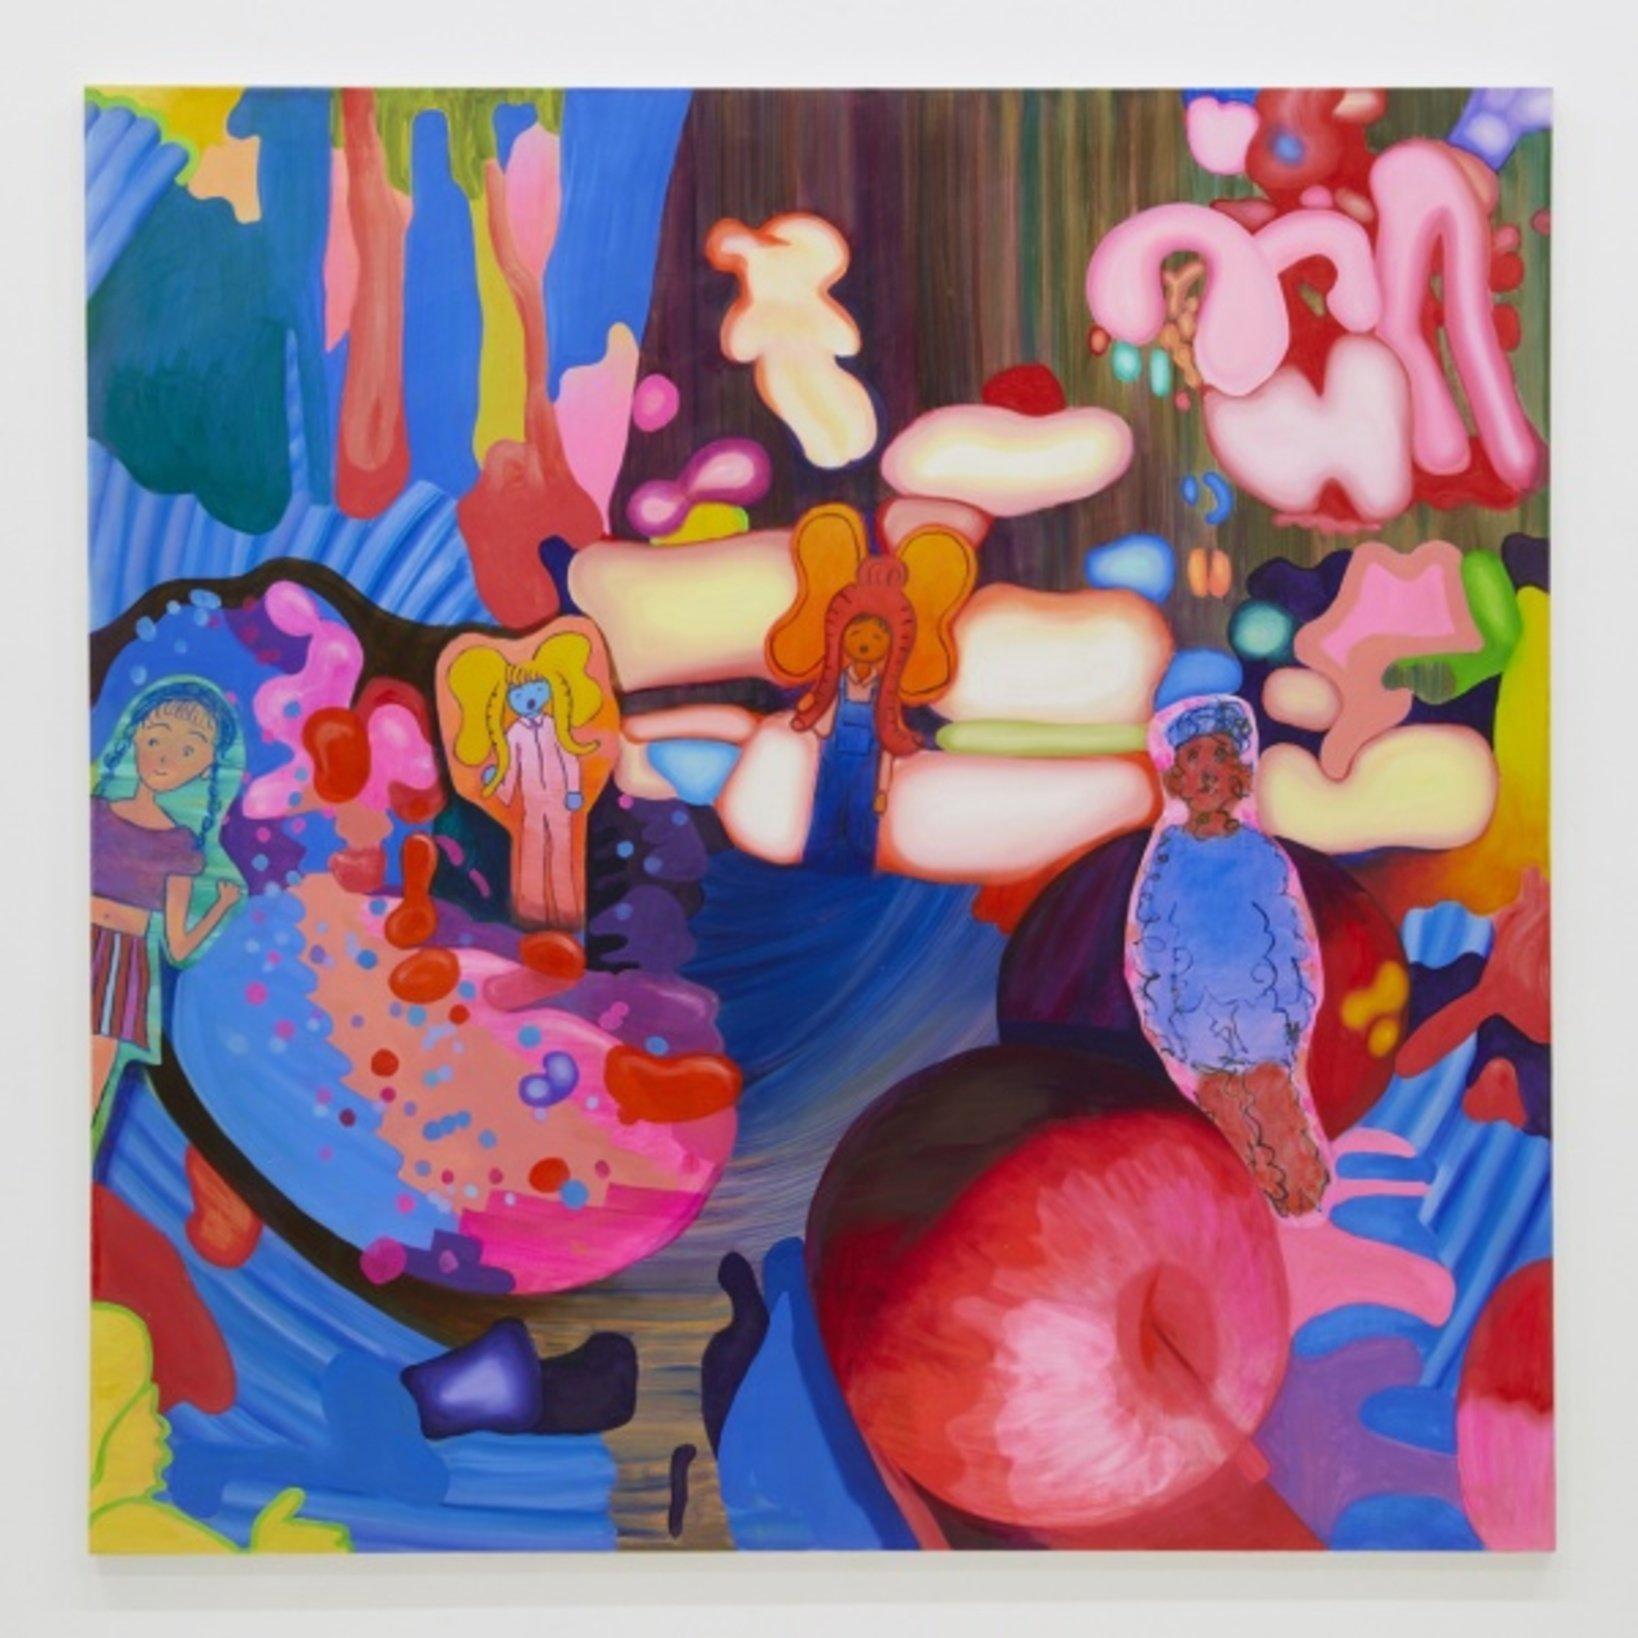 Vortex 2018 oil on canvas 150.2*150.4cm ©Aya Ito